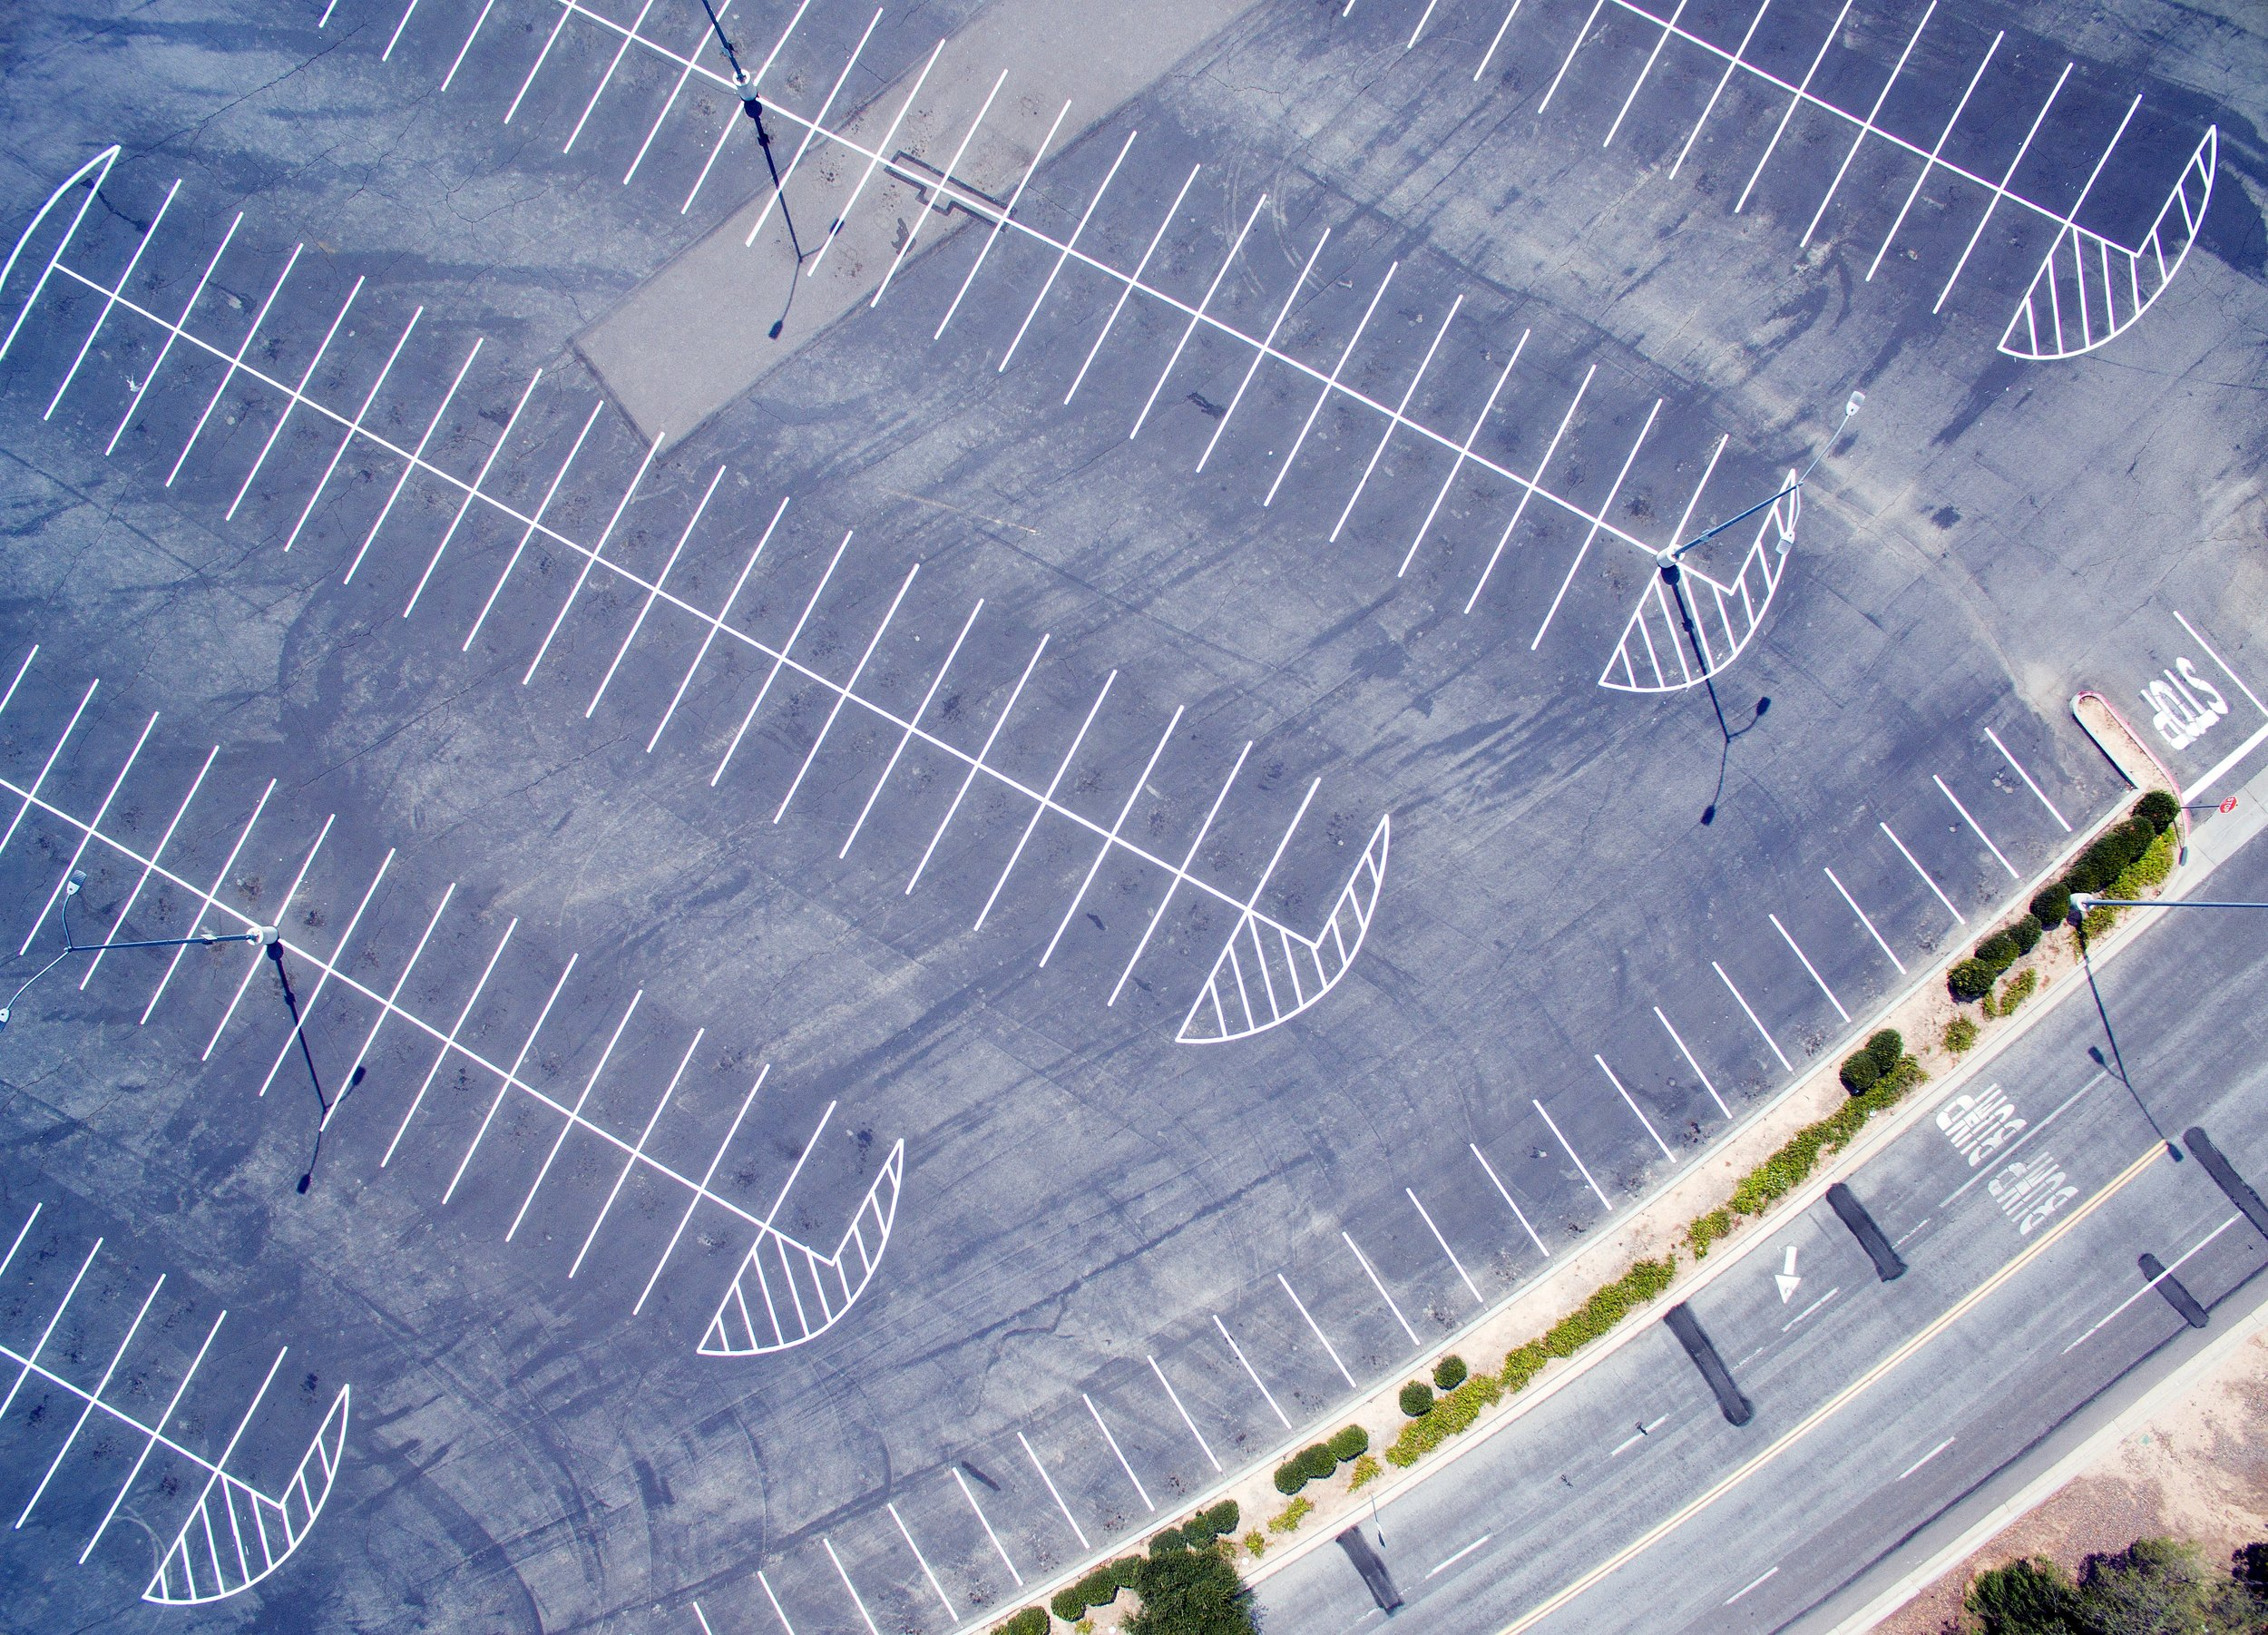 Parking Lot Update photo.jpg